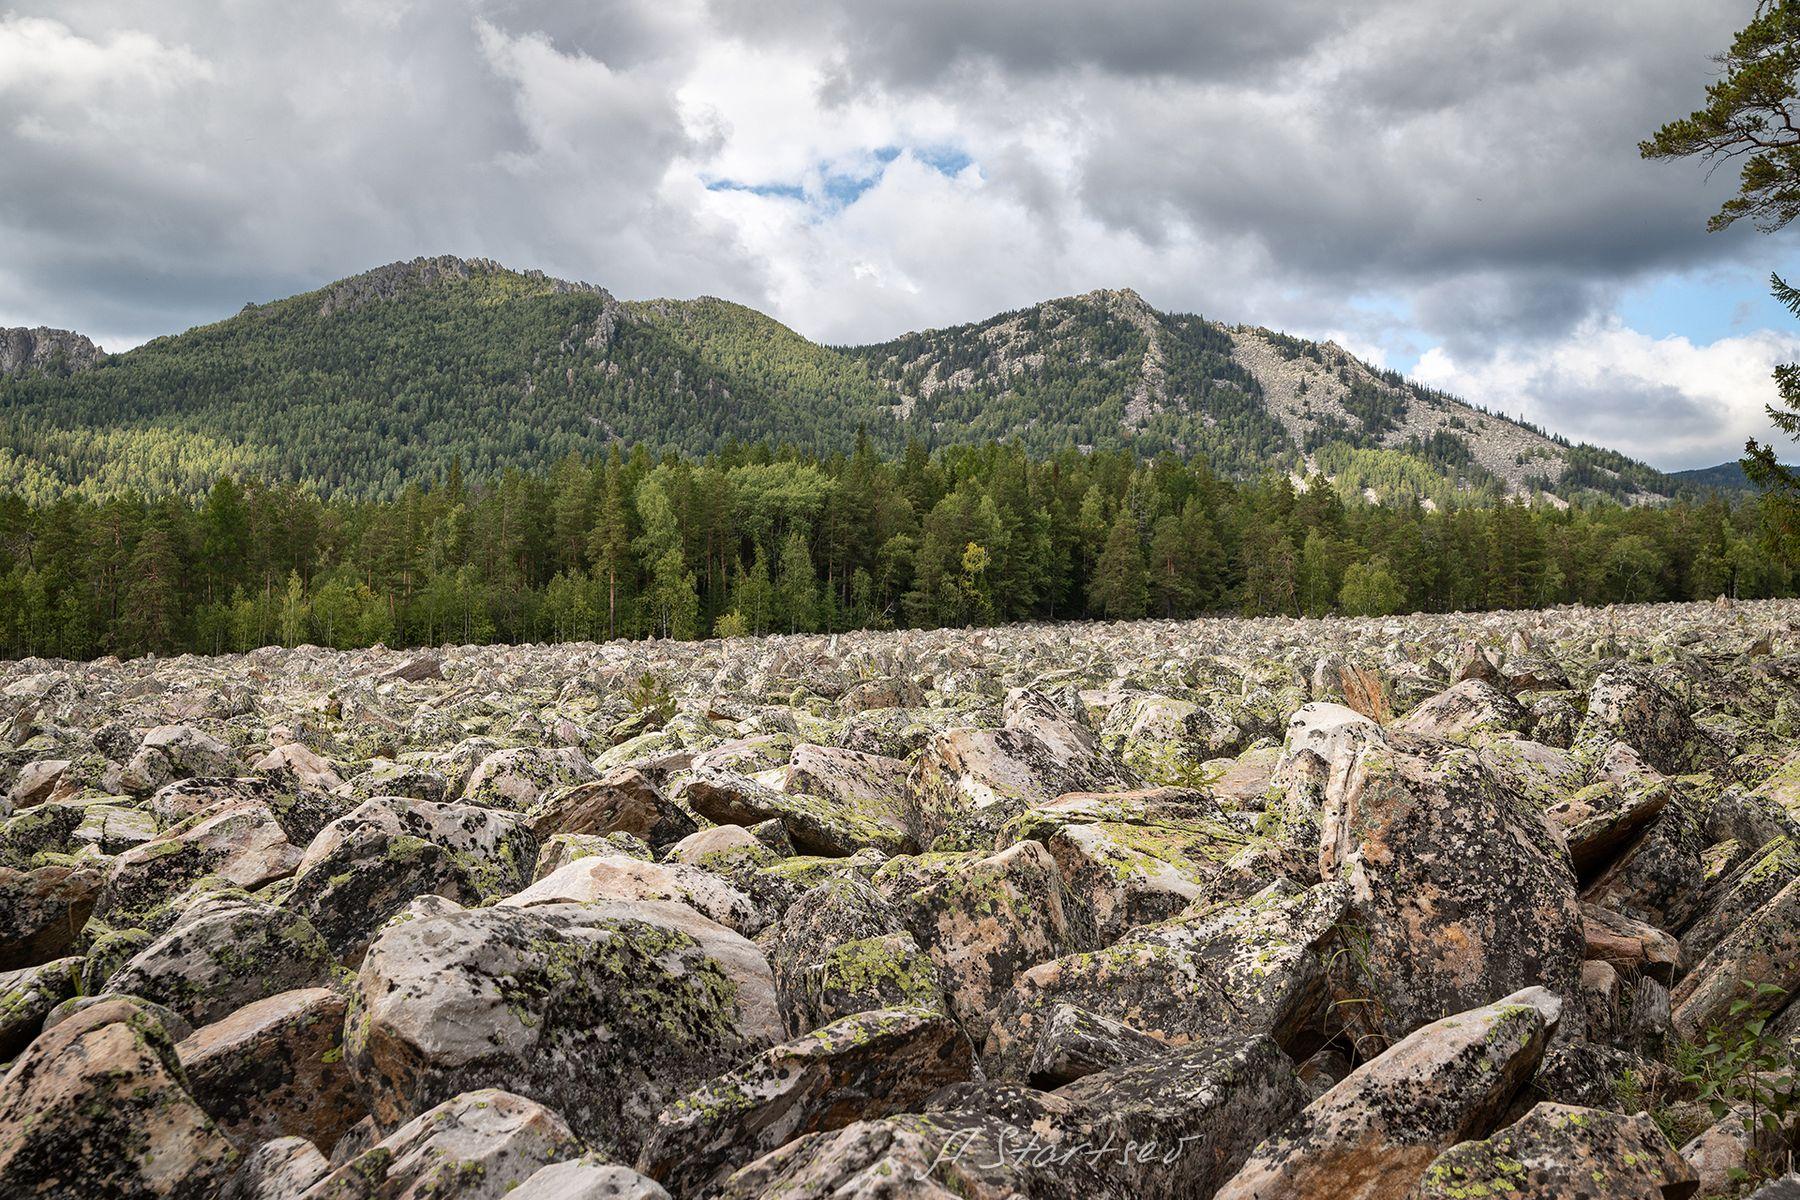 Двуглавая Сопка, Таганай Урал туризм Таганай природа пейзаж осень небо лес горы облако